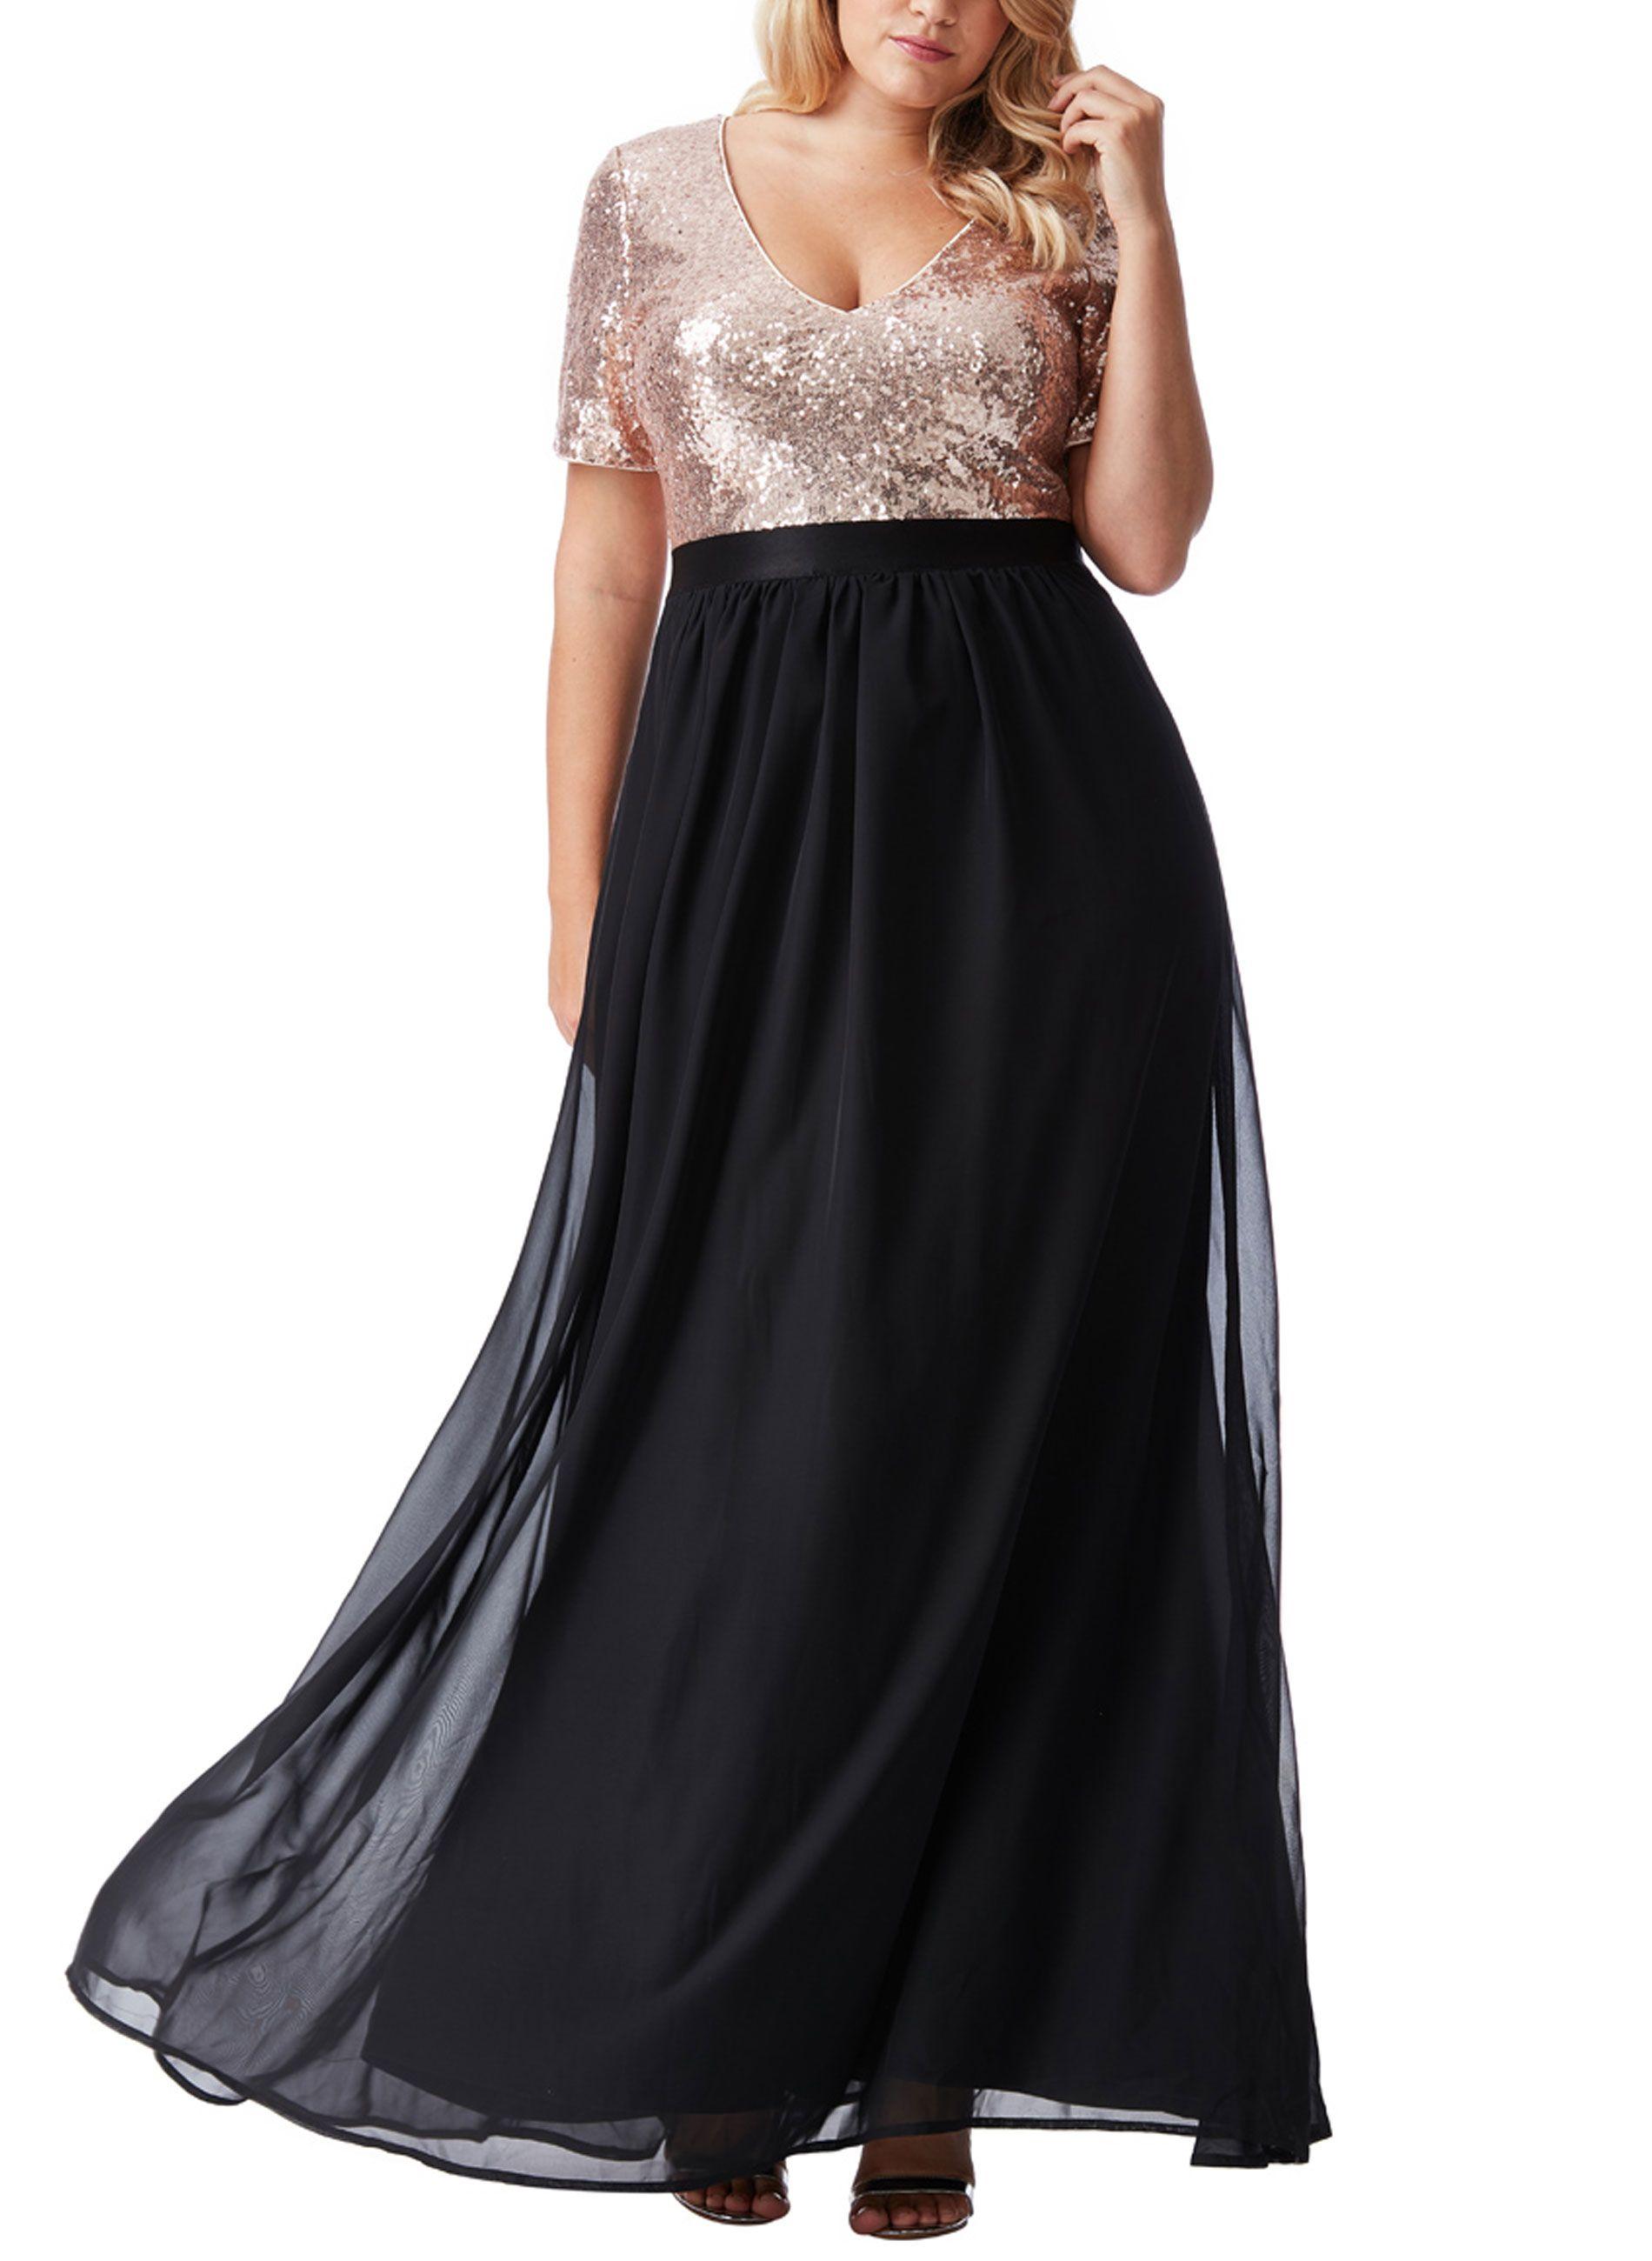 865dbcb4fe7b Αμπιγέ μάξι φόρεμα με χρυσή παγιέτα στο πάνω μέρος και μαύρη μουσελίνα στο  κάτω μέρος.